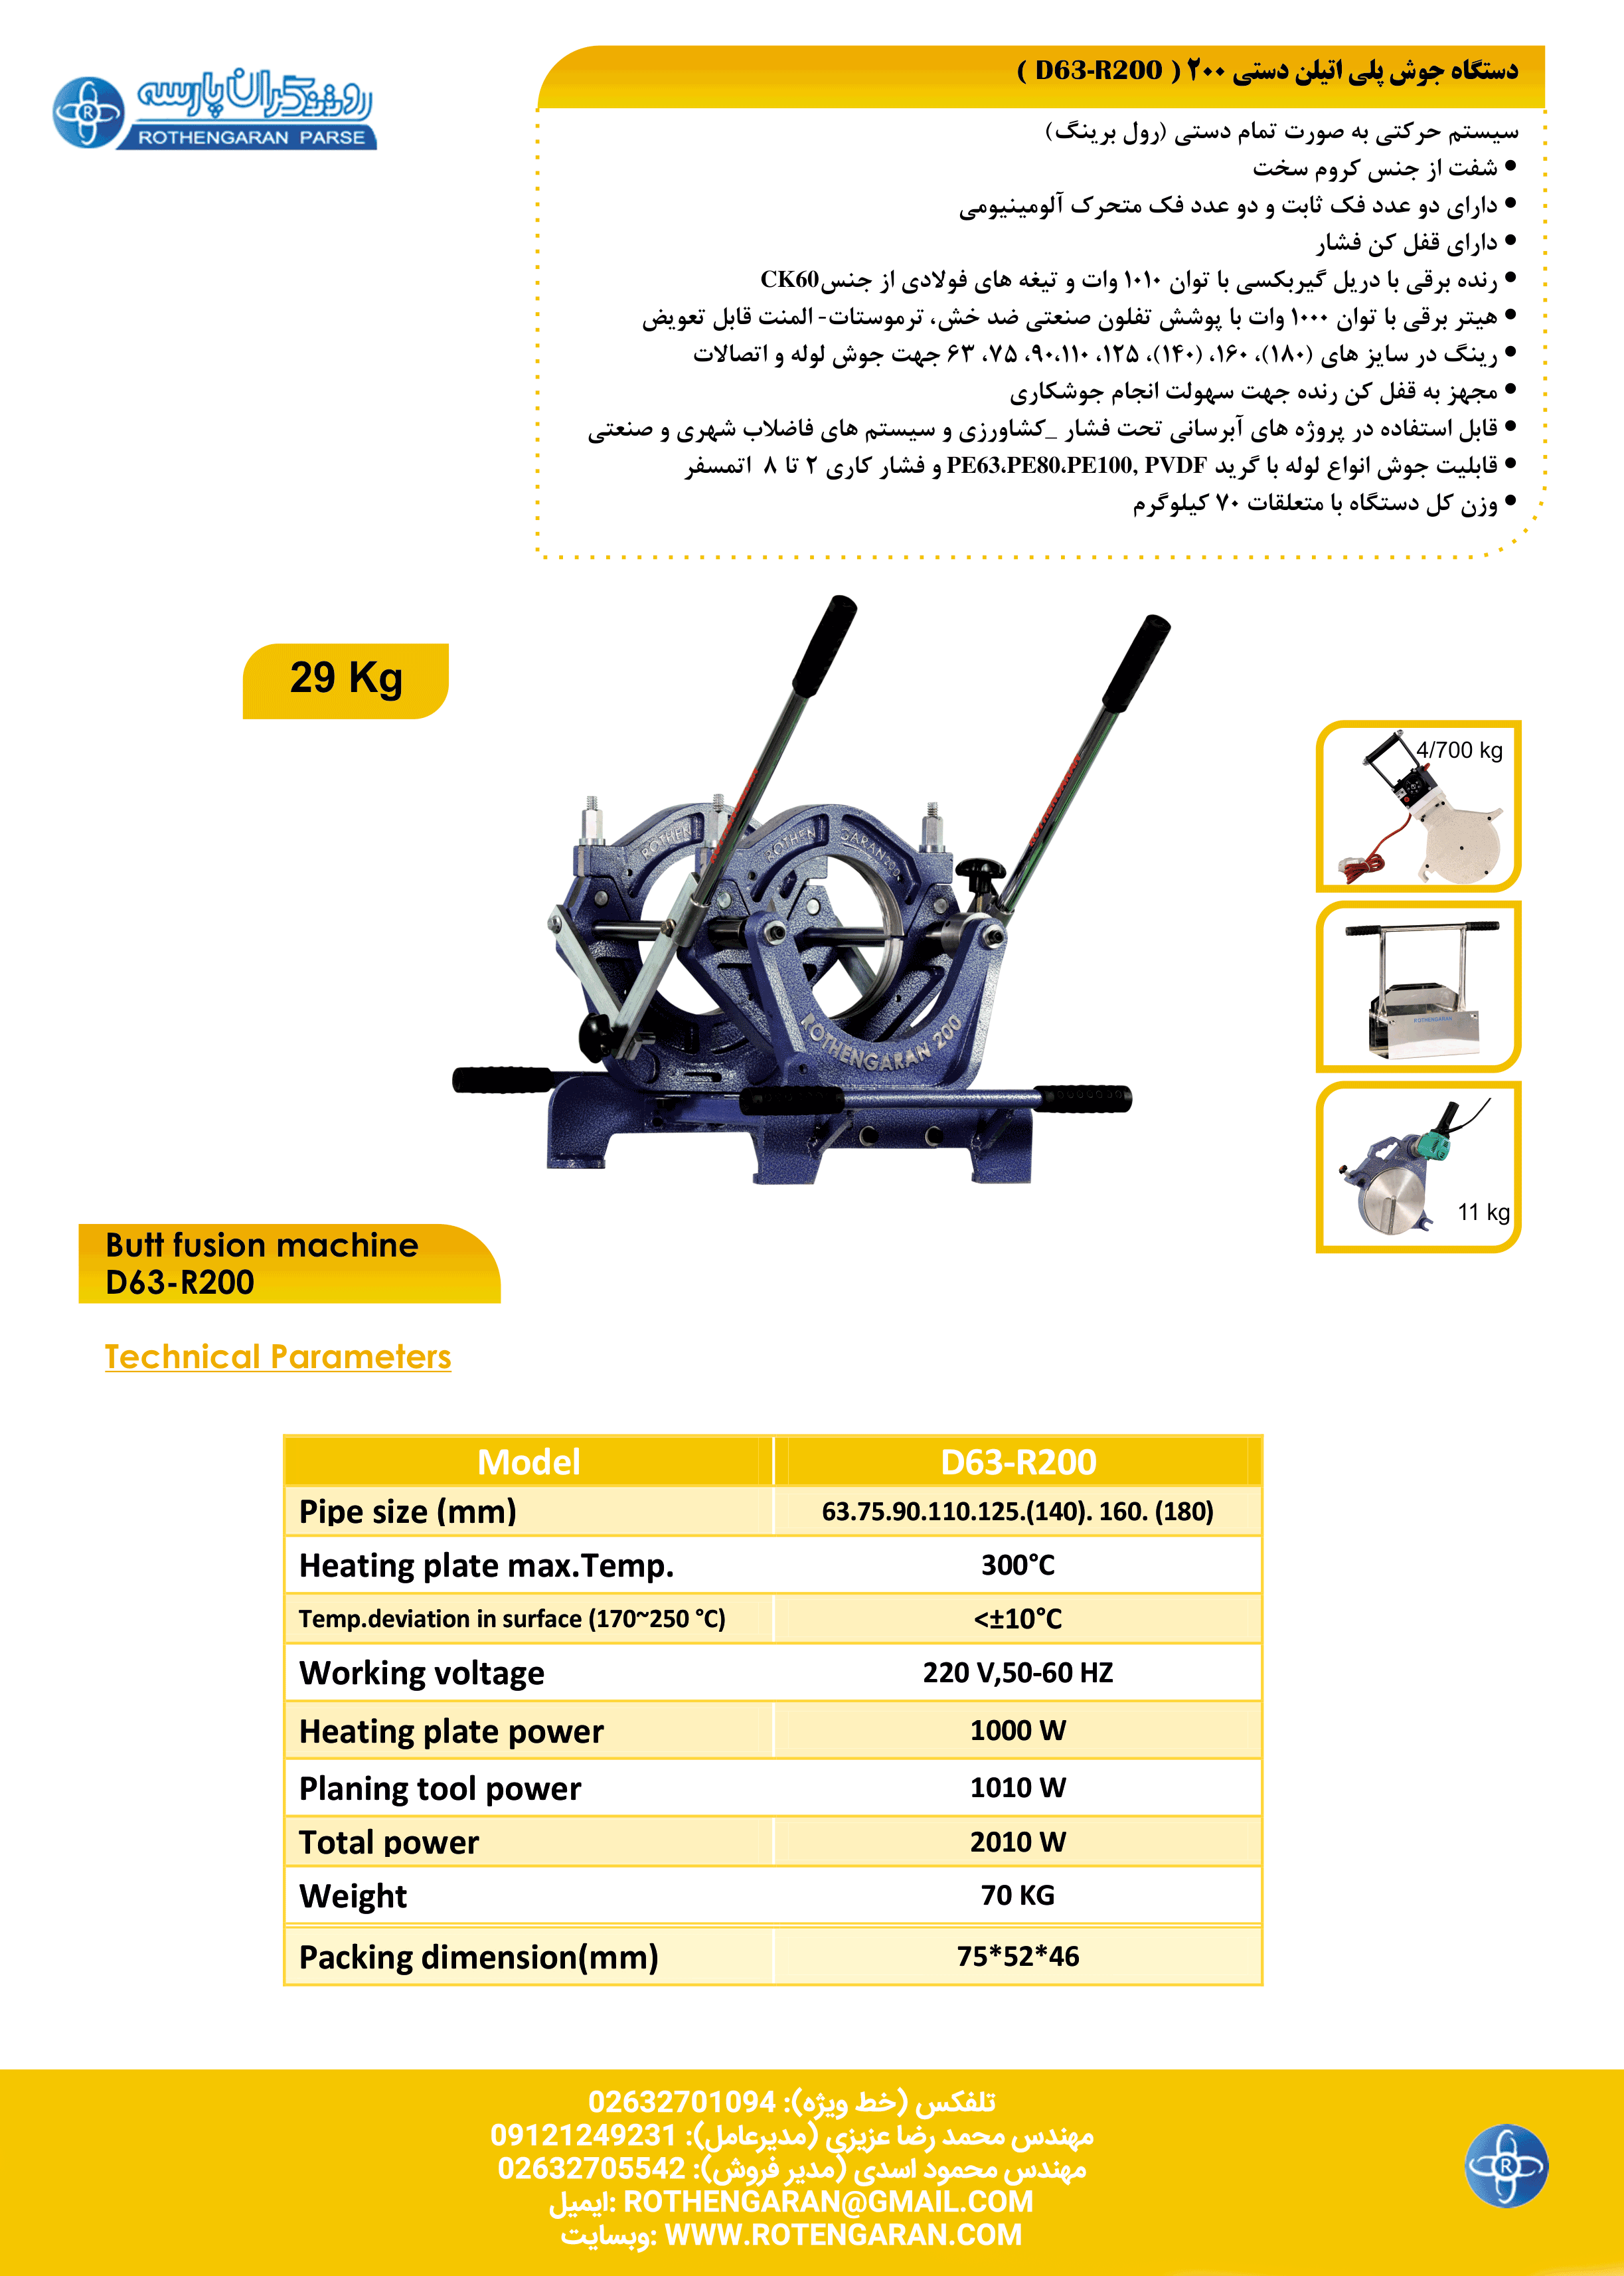 دستگاه جوش پلی اتیلن